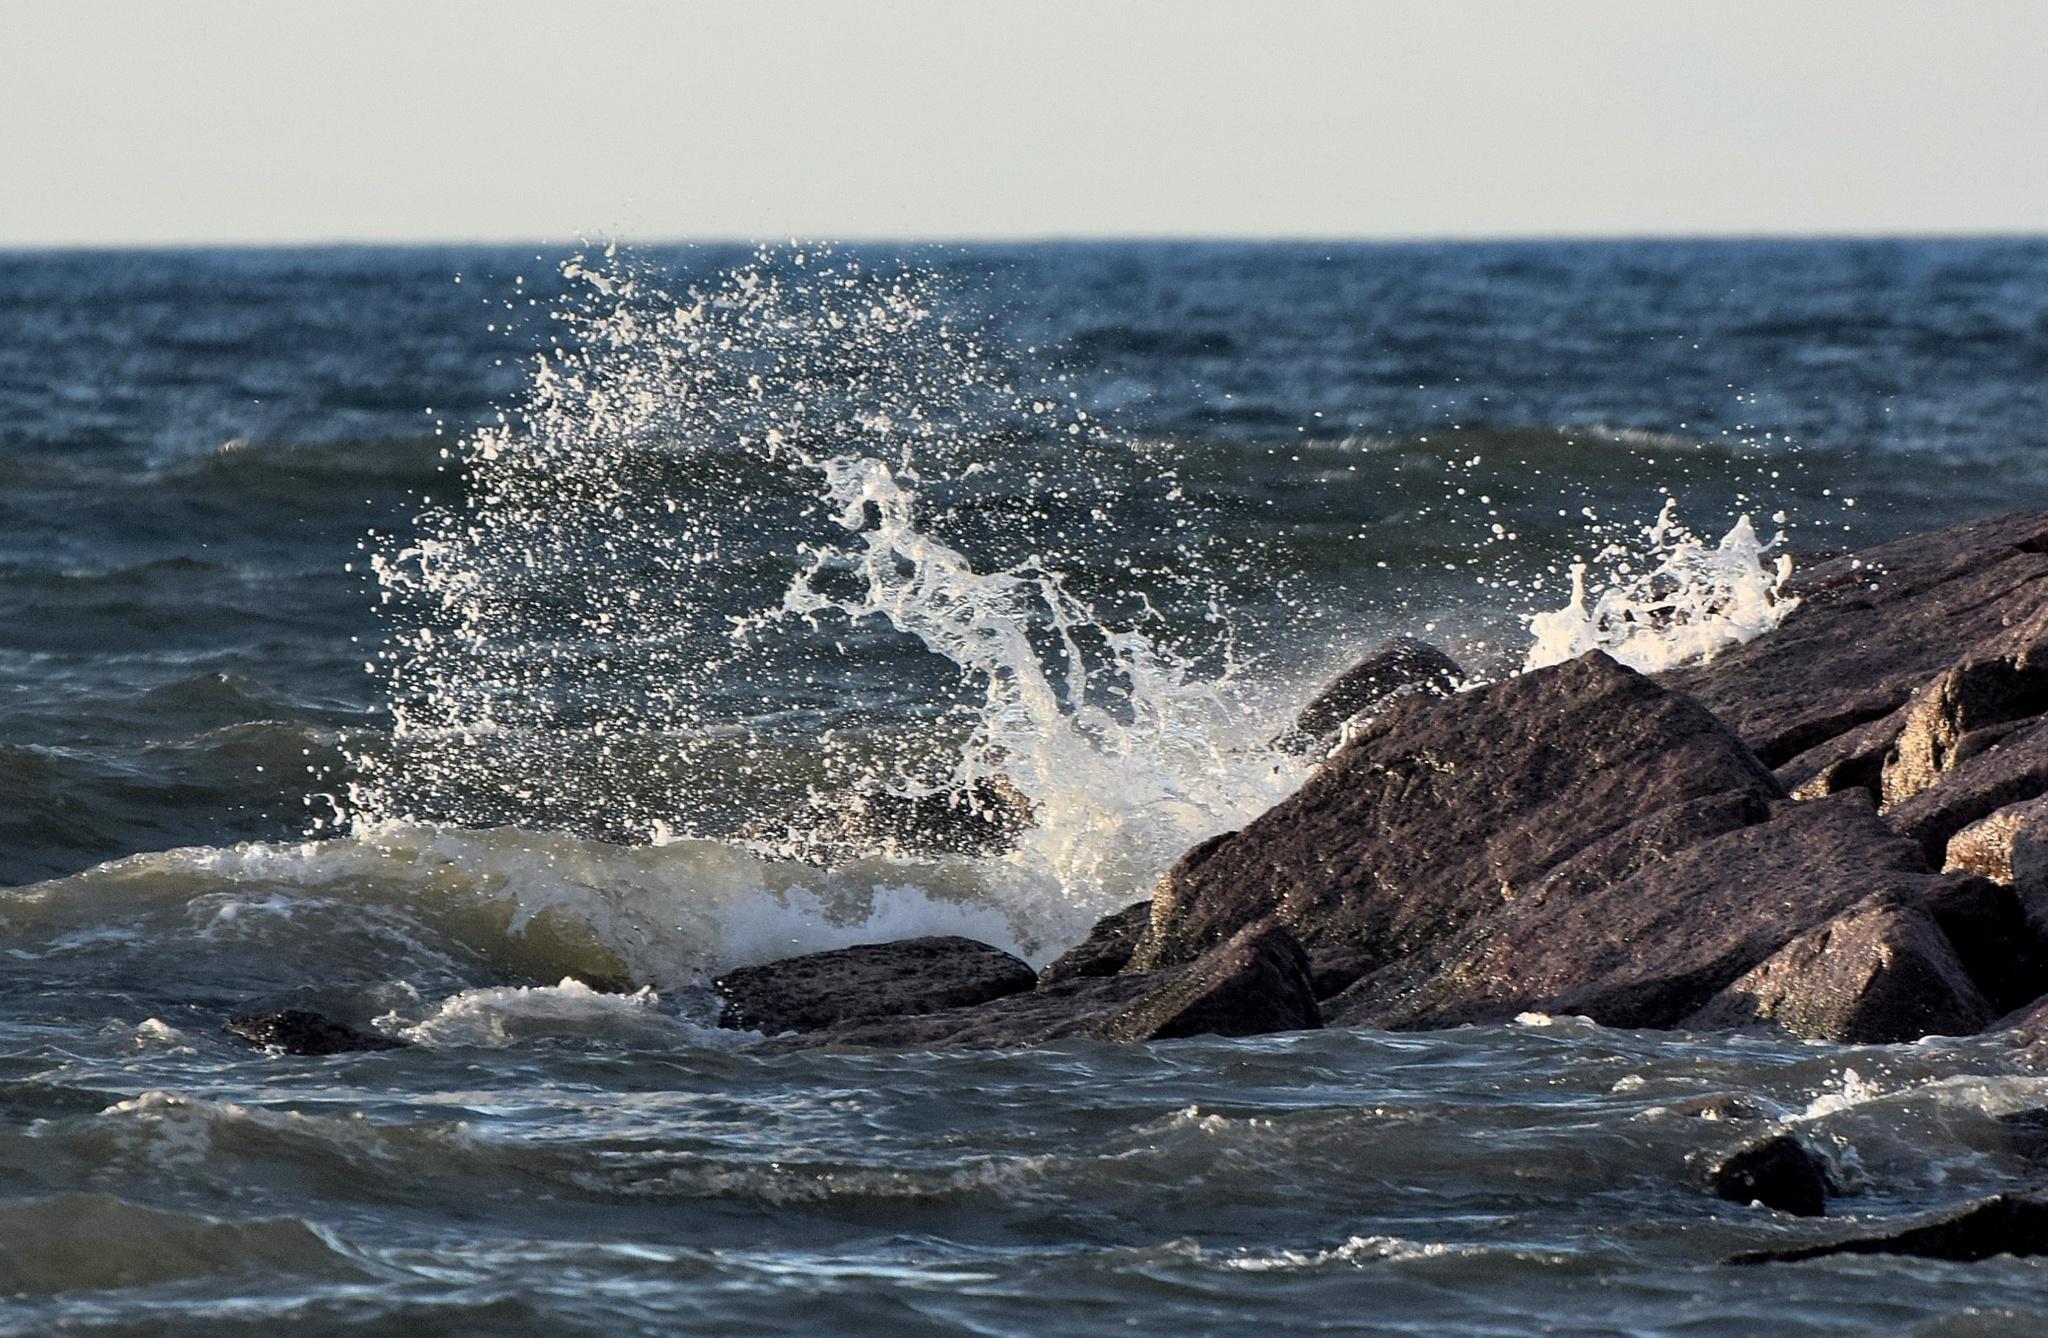 Galveston Tx 286~Crashing Waves 7 by Lawrence Scott Hess